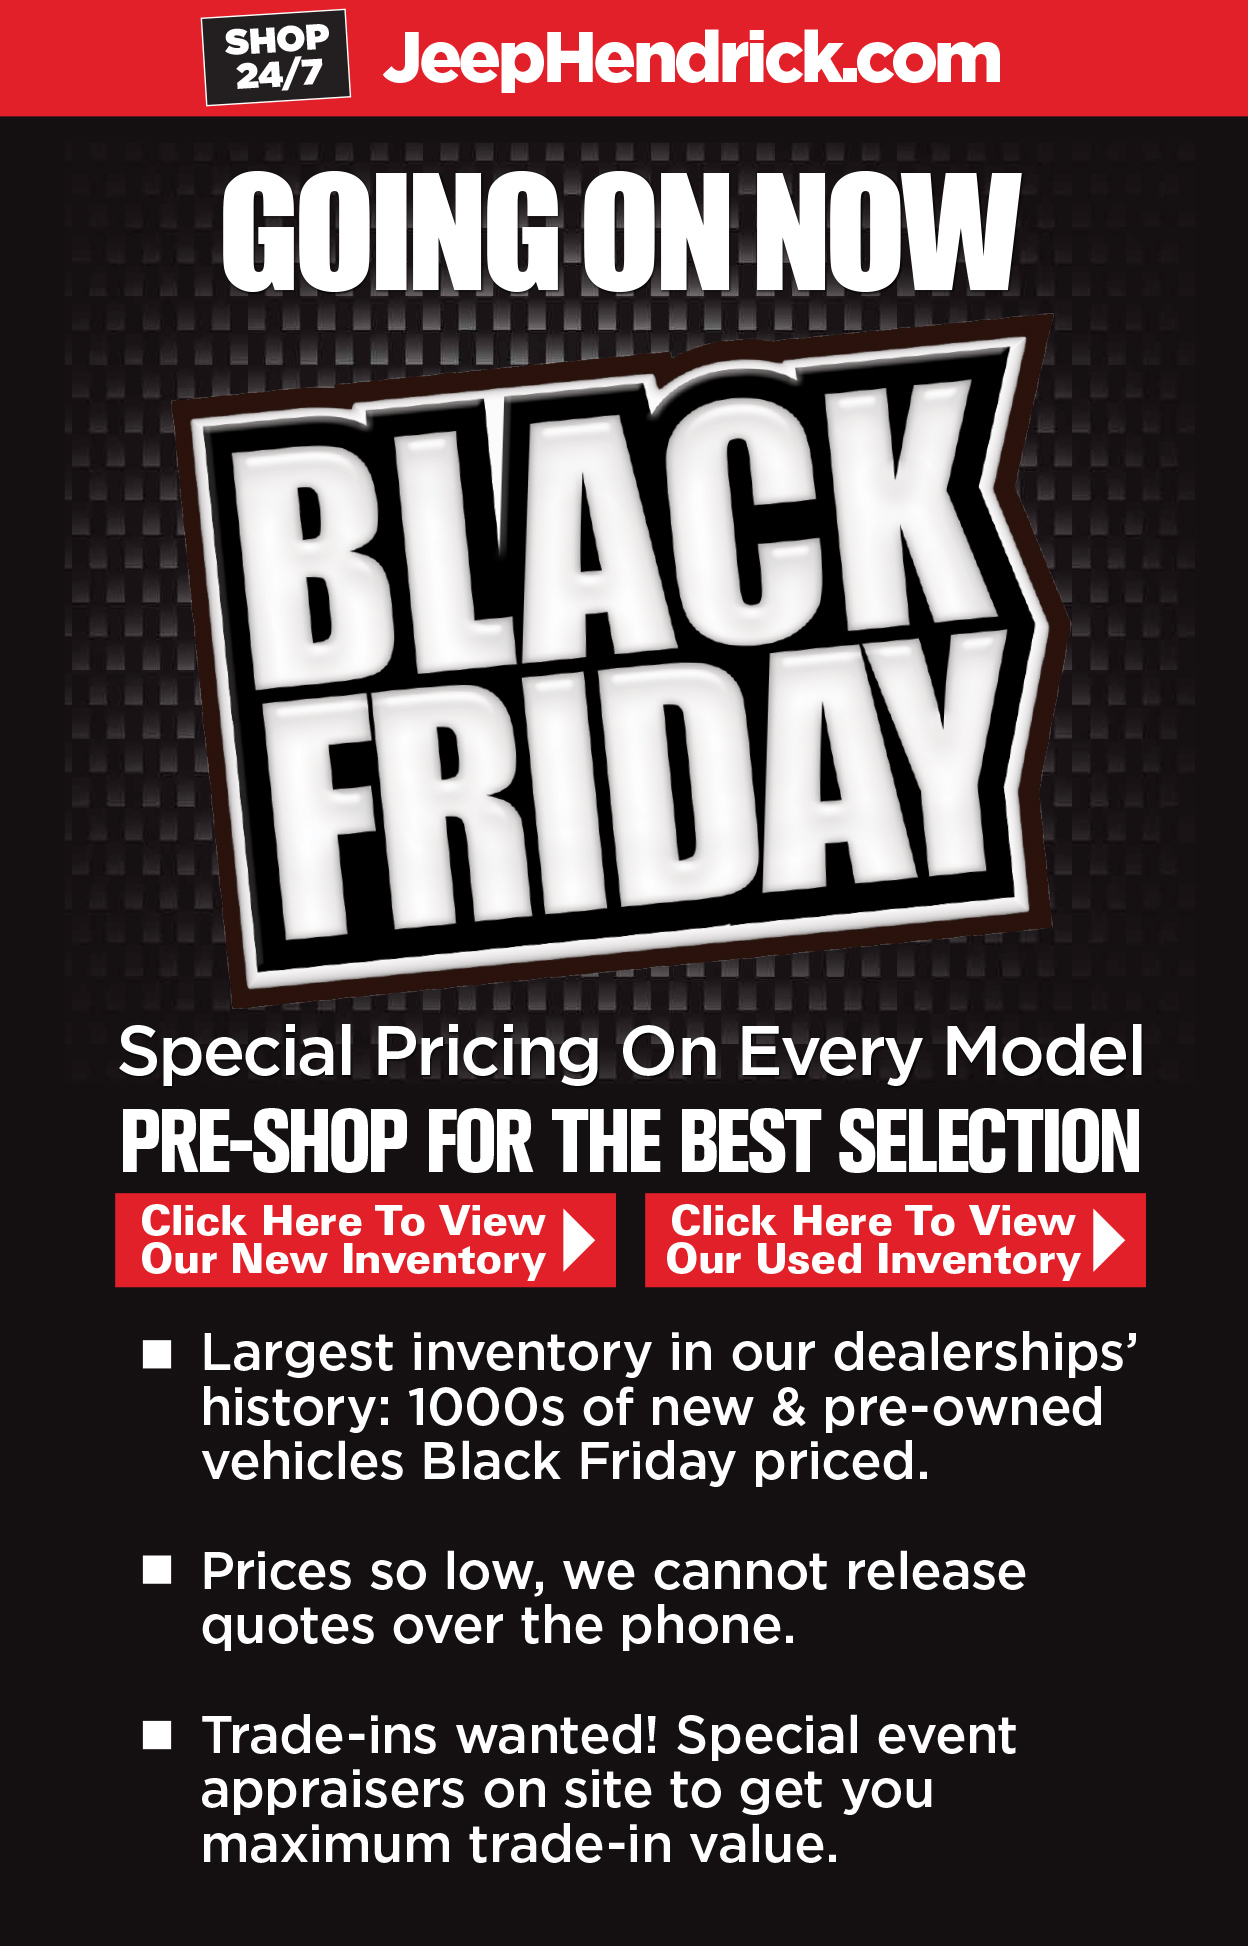 Black Friday Sales Event | Rick Hendrick Jeep Chrysler Dodge ...